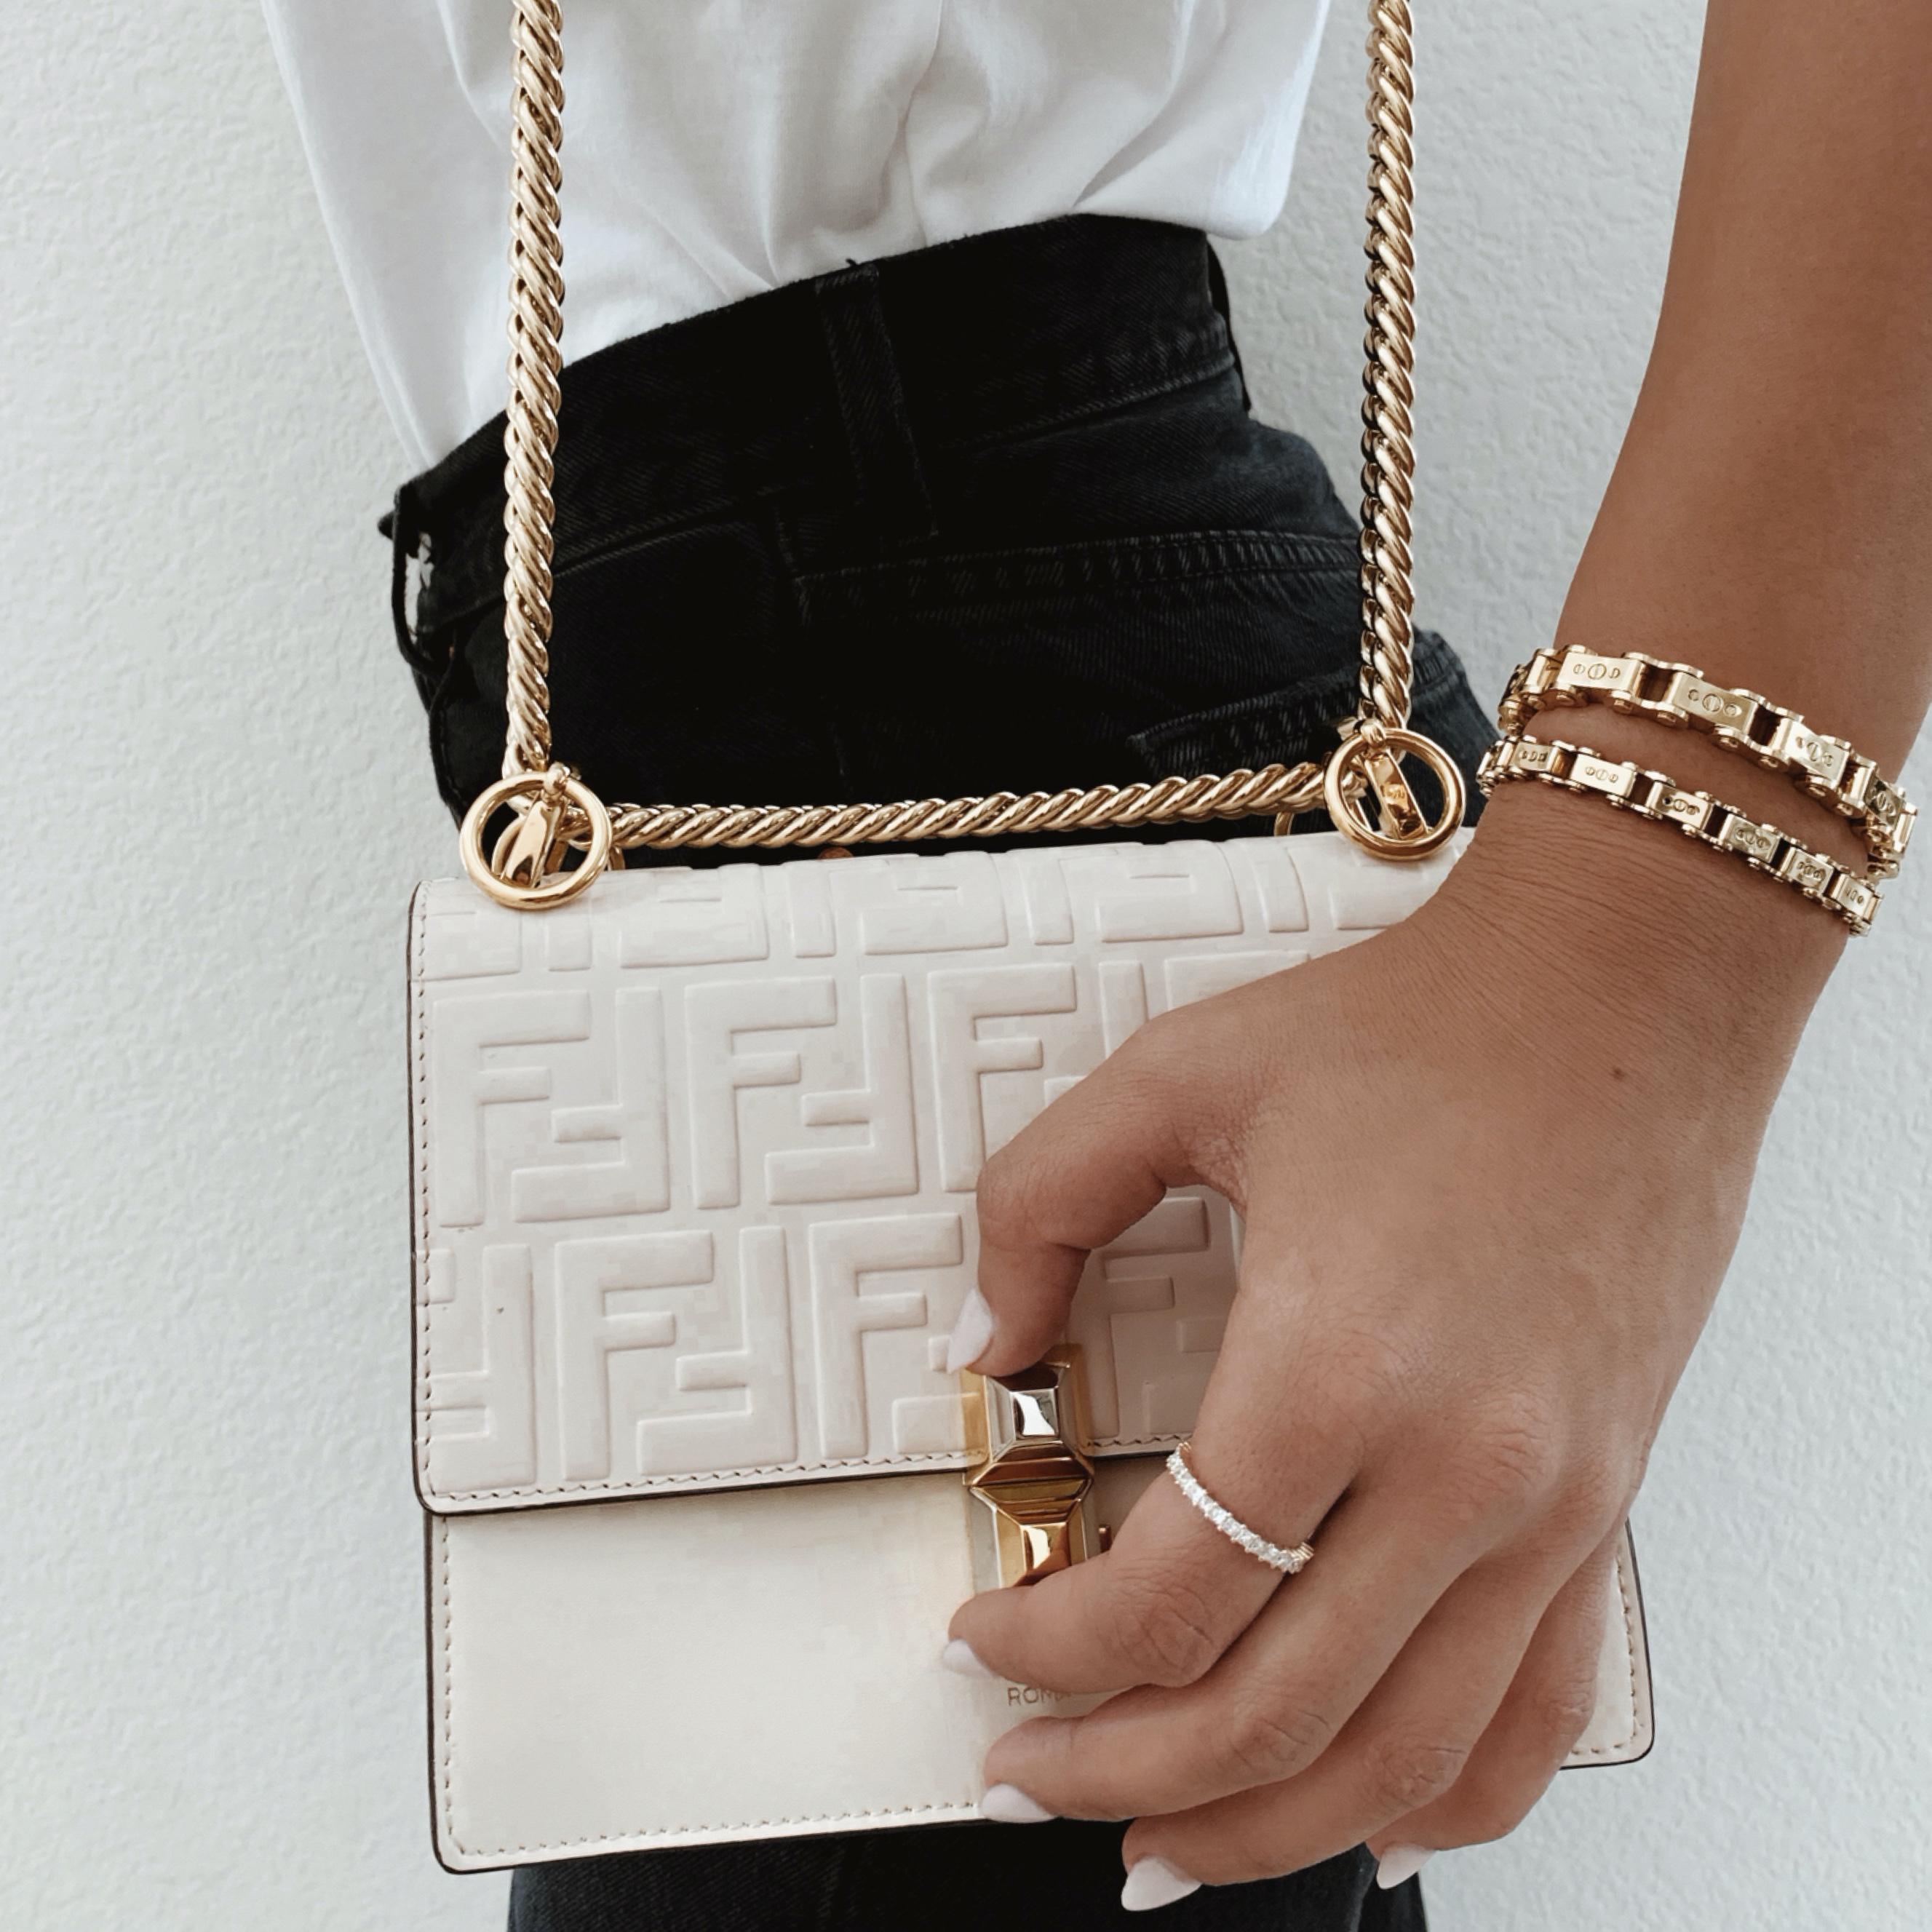 Women's Gold 9.5mm Bicycle Bracelet next to handbag